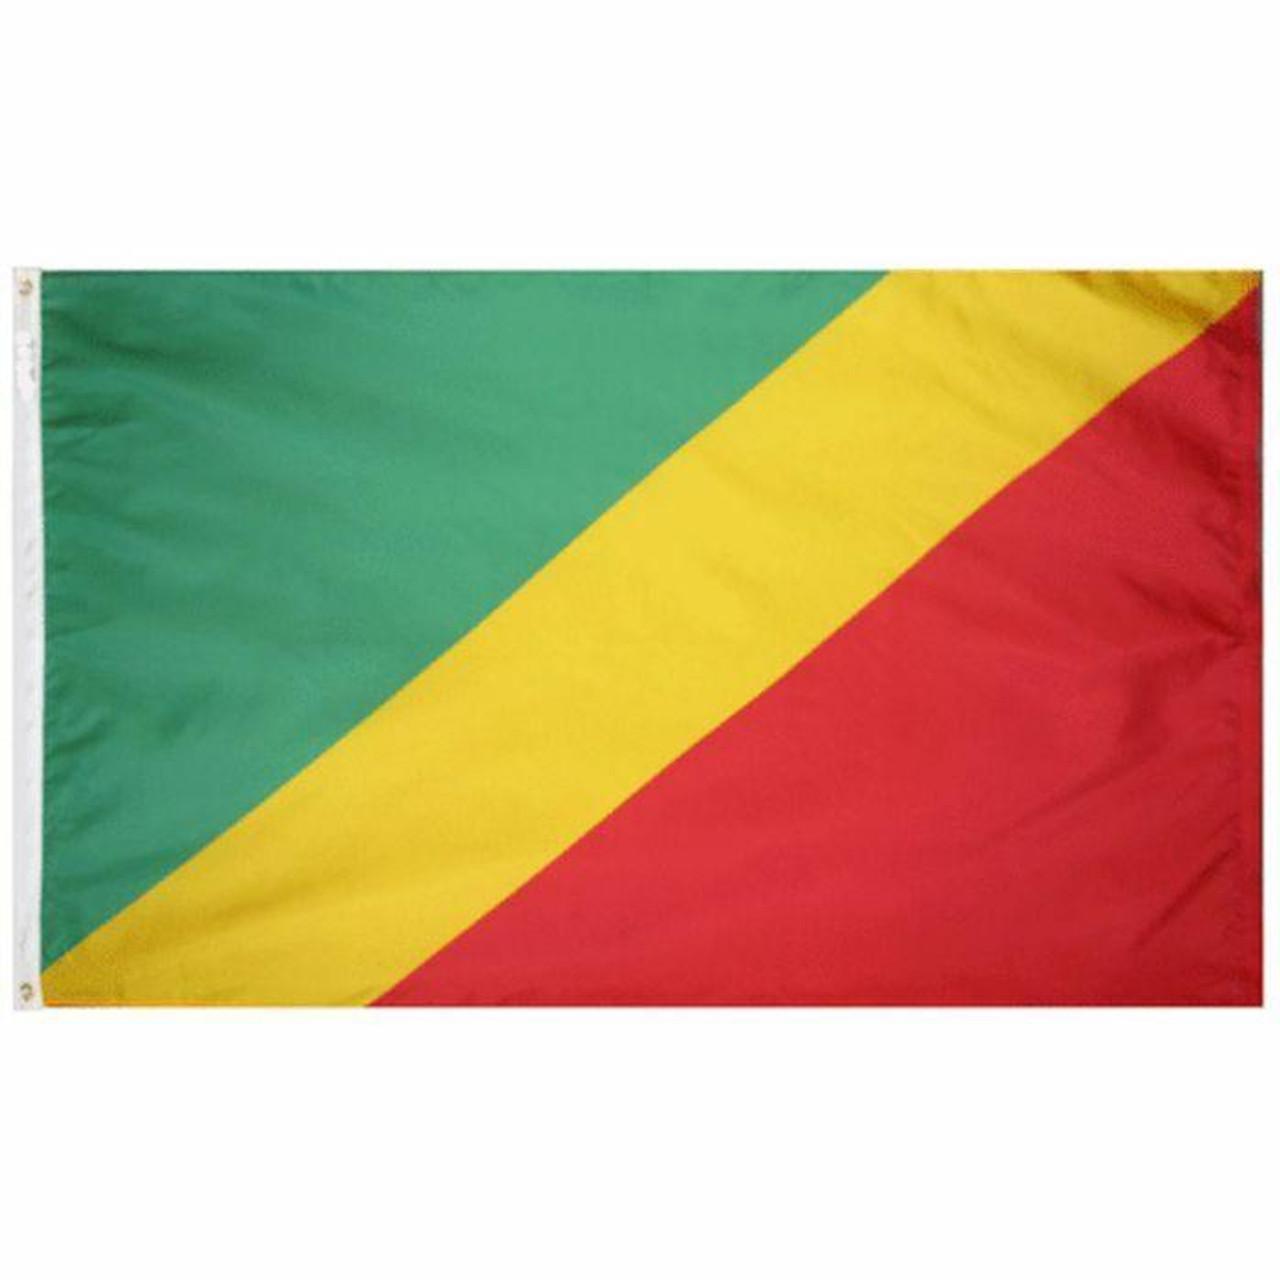 Congo Republic of Flag